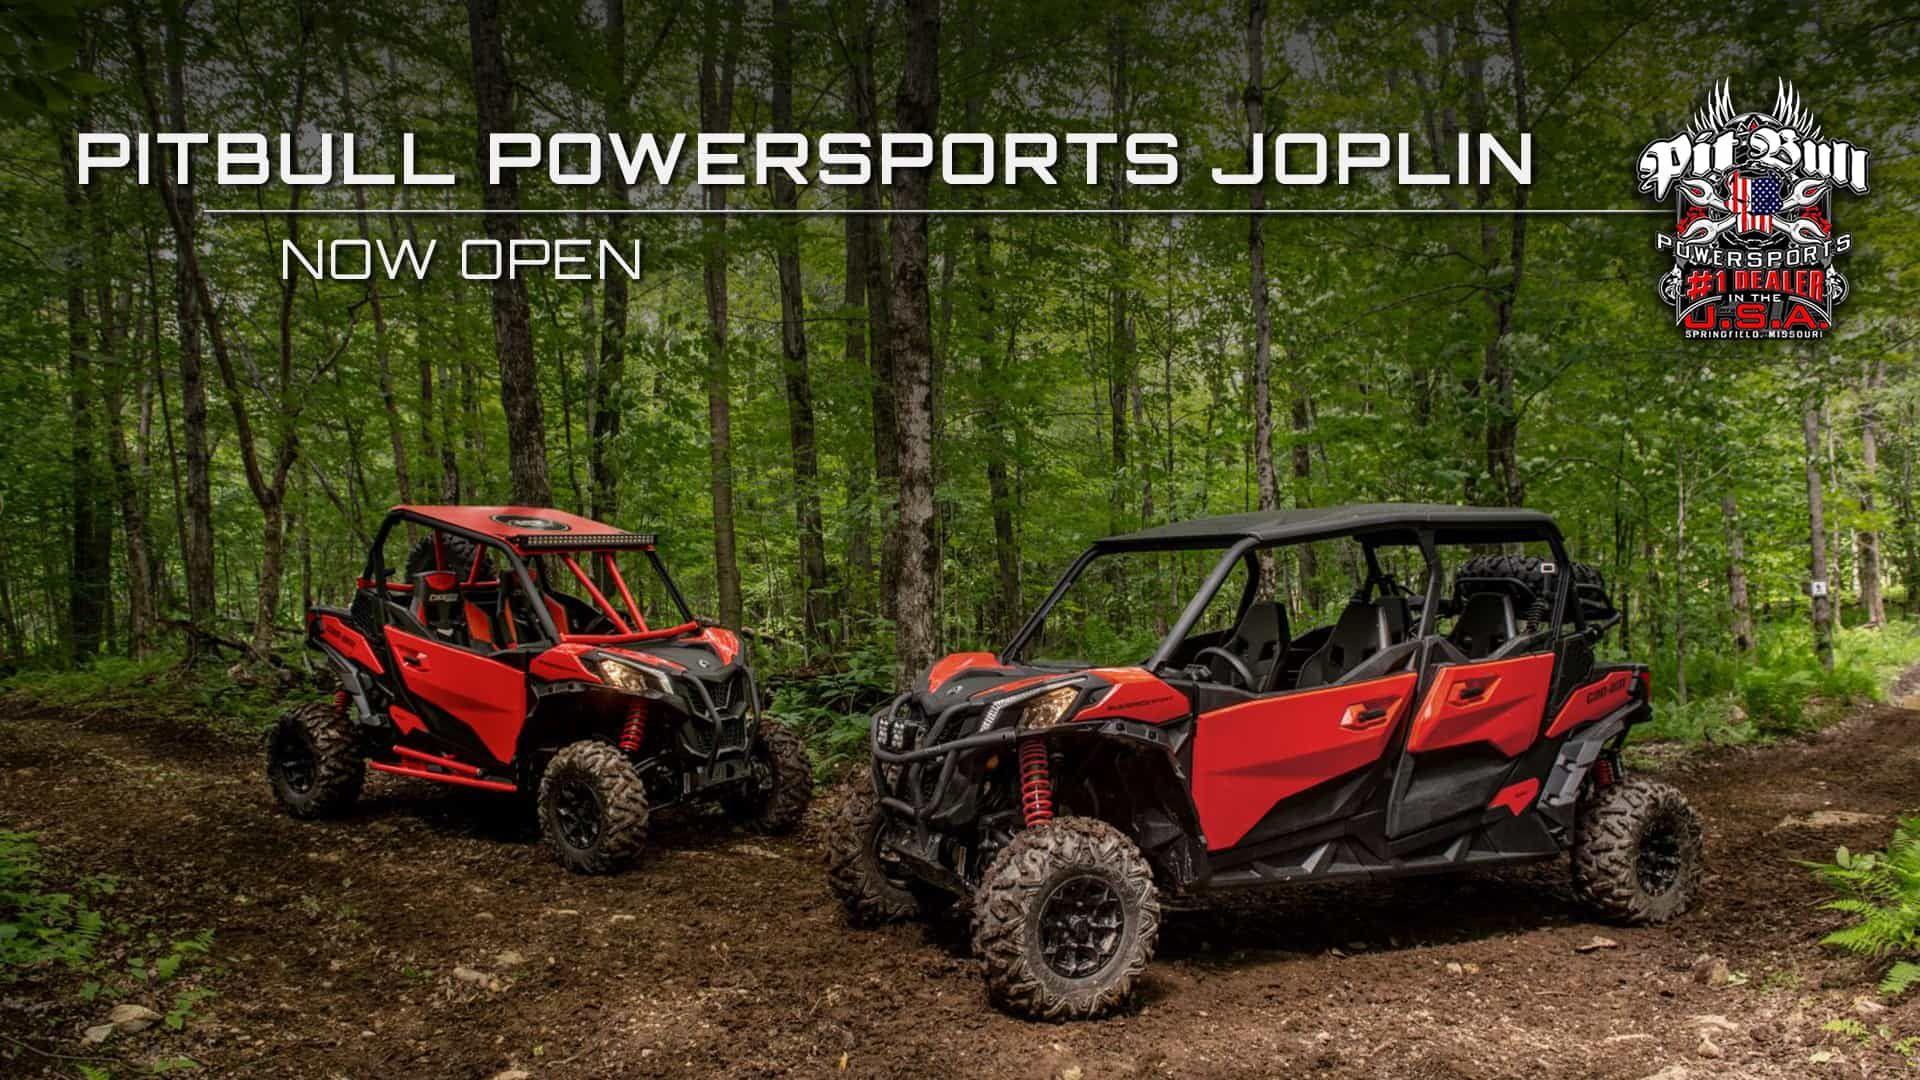 Pitbull Powersports Joplin Location Now Open